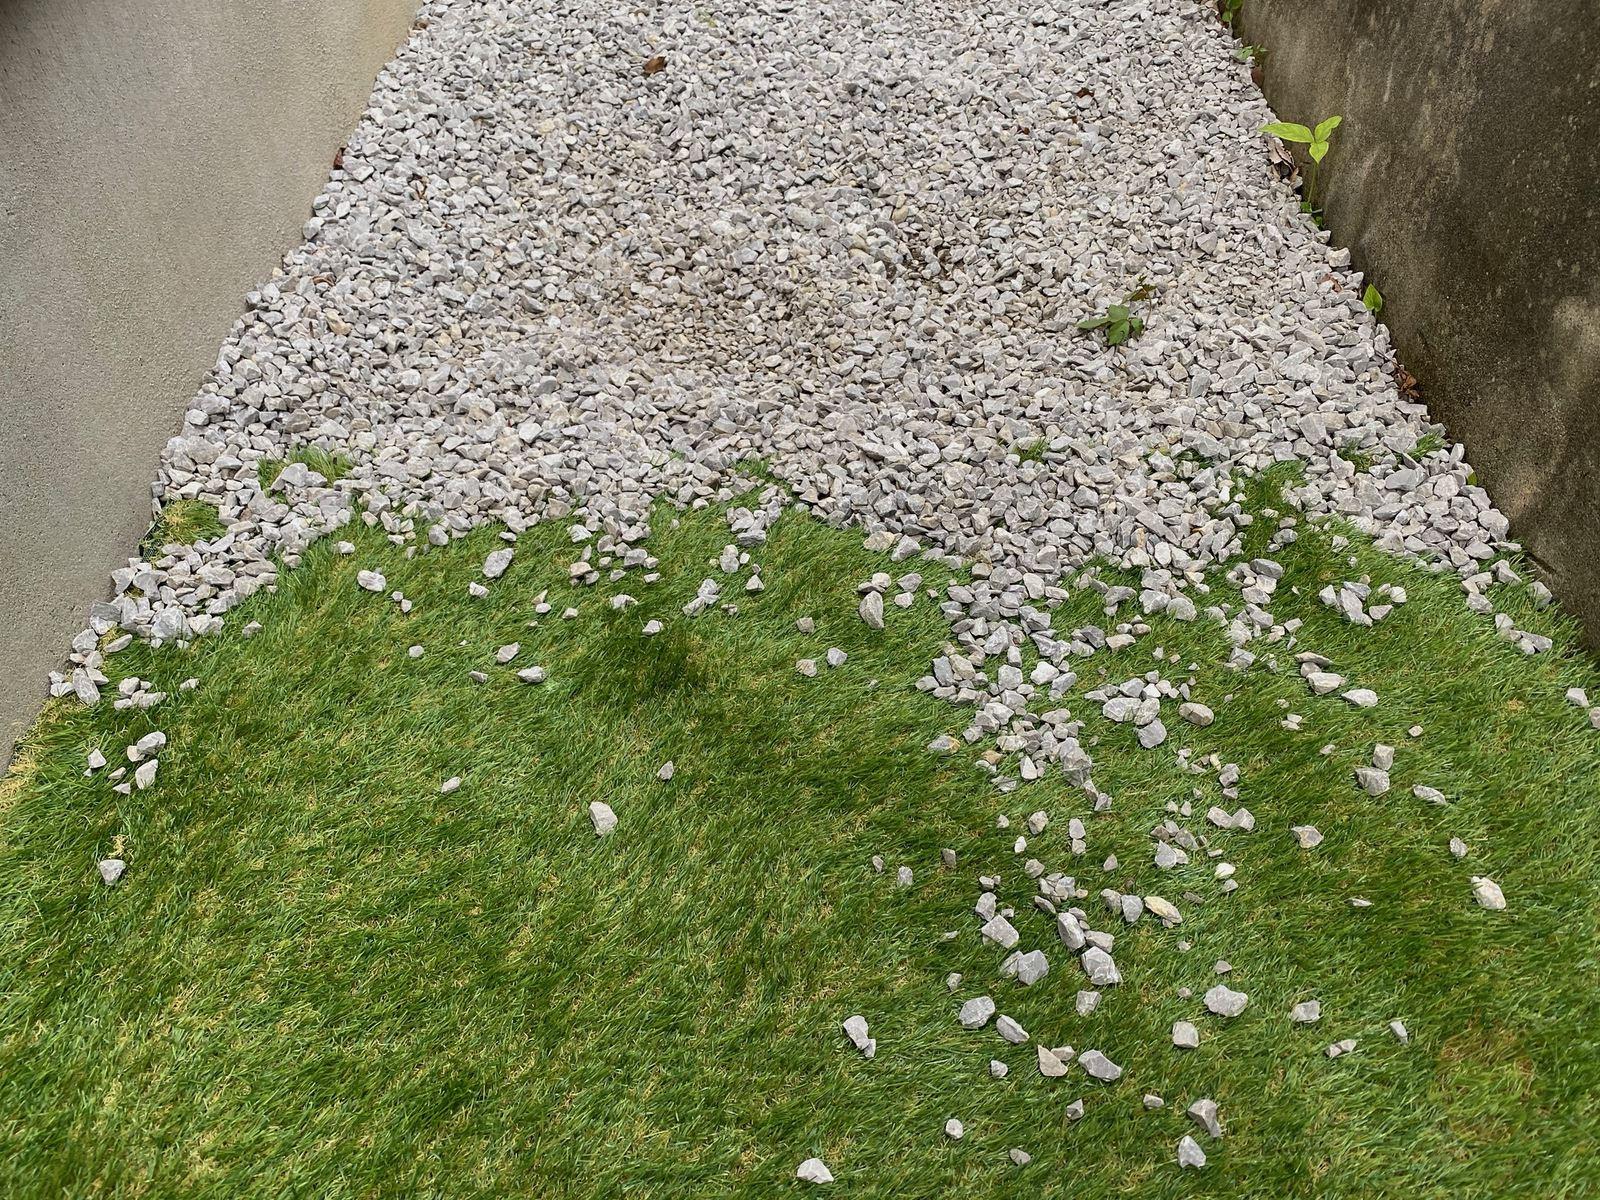 Artificial-lawn-in-backyard-review-17.jpeg